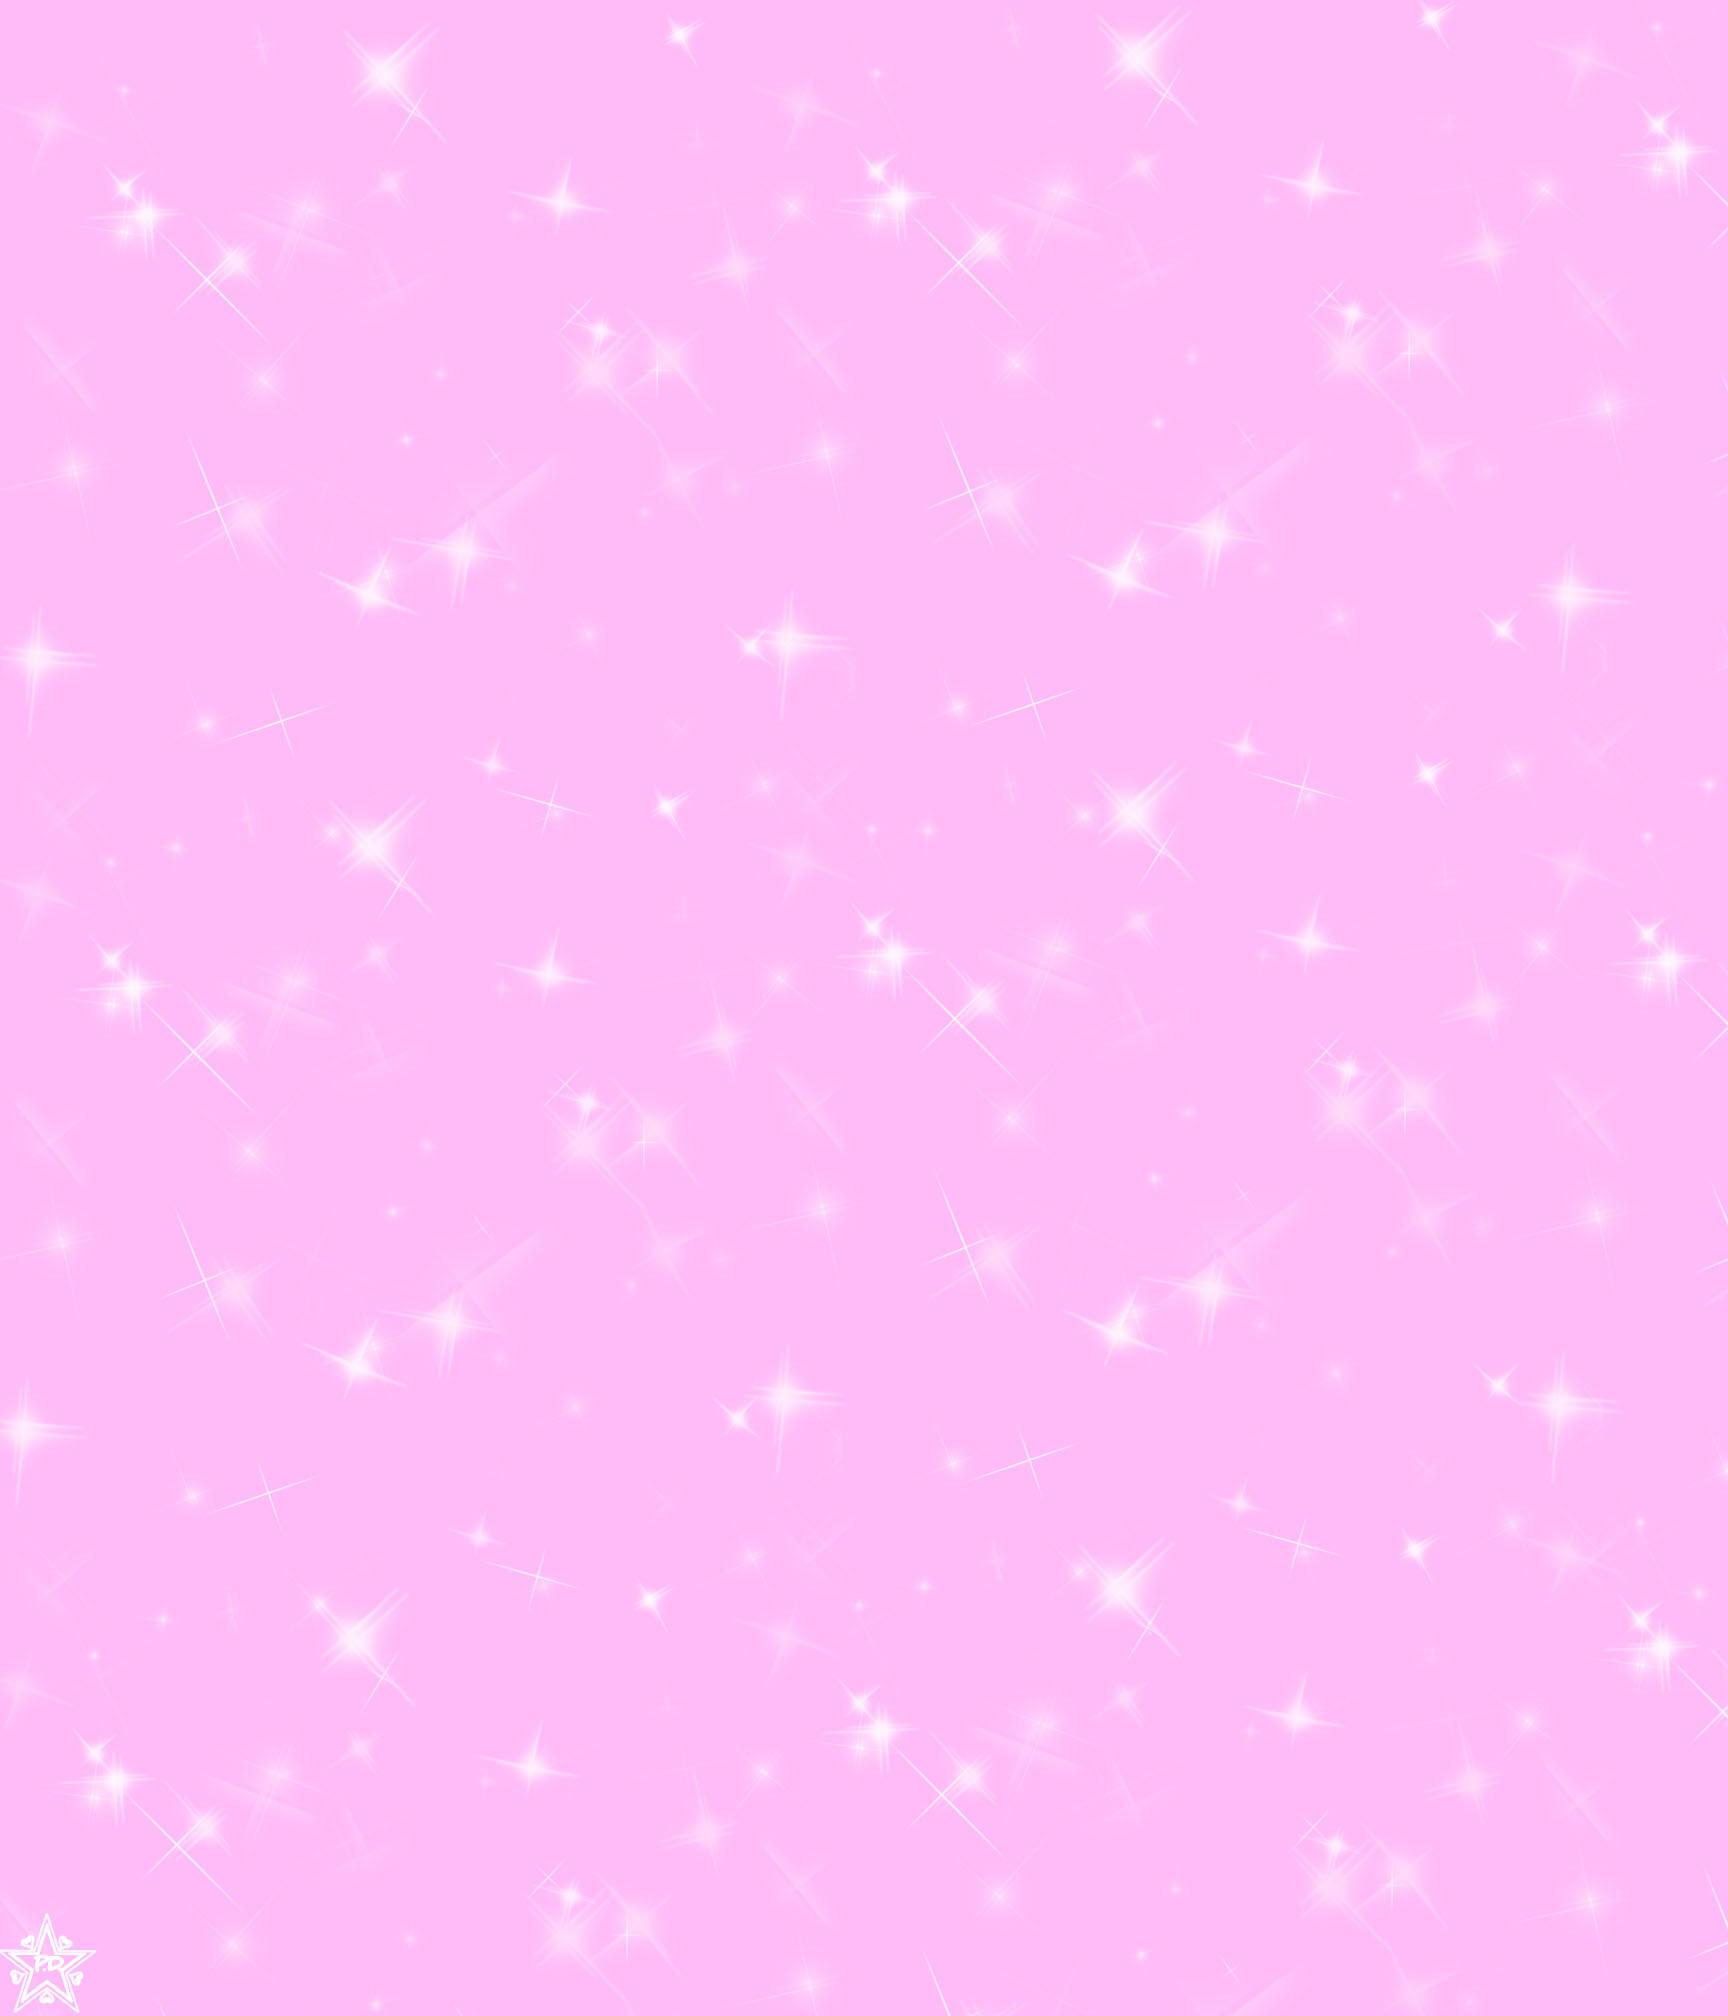 Pink Sparkly Backgrounds Pink sparkly background by